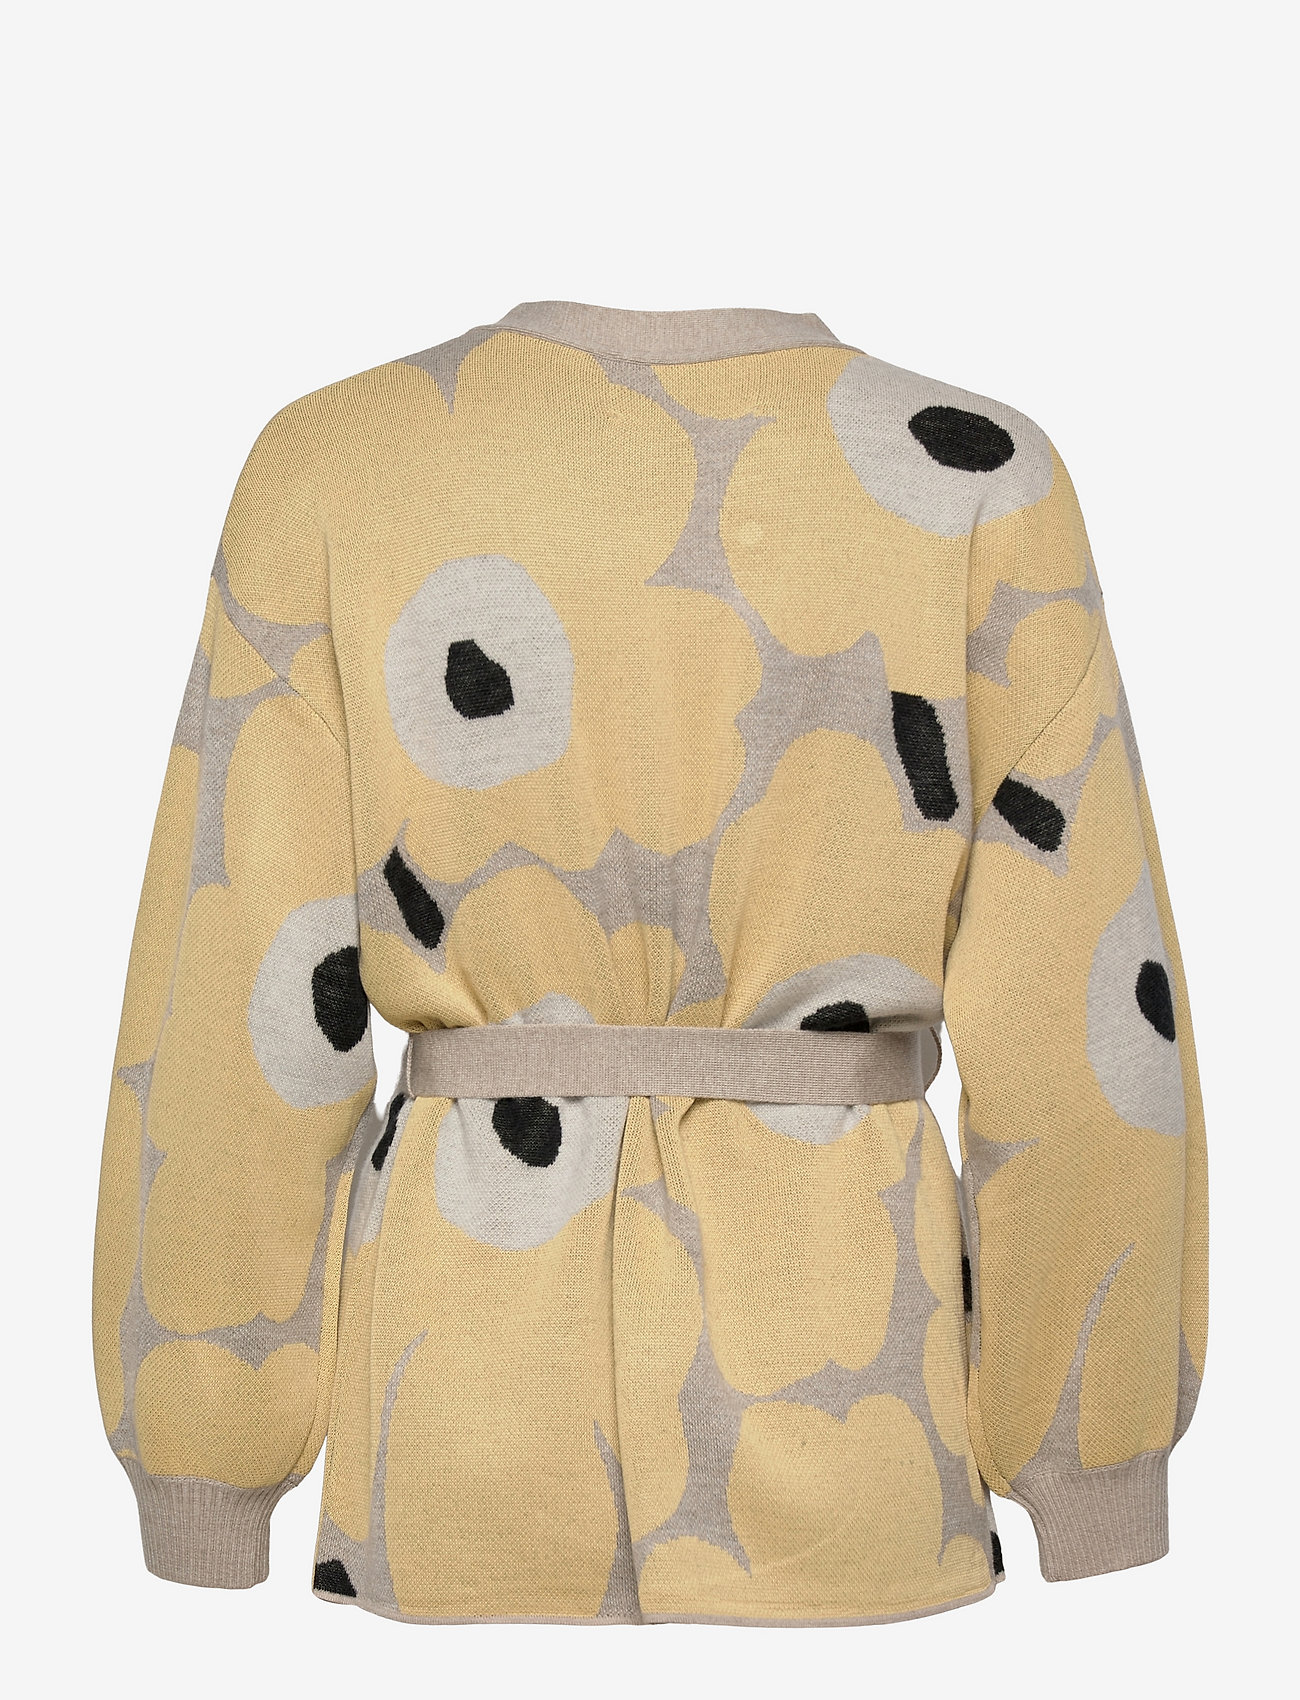 Marimekko - UNEKSUVA UNIKKO CARDIGAN - cardigans - beige,light yellow,black - 1